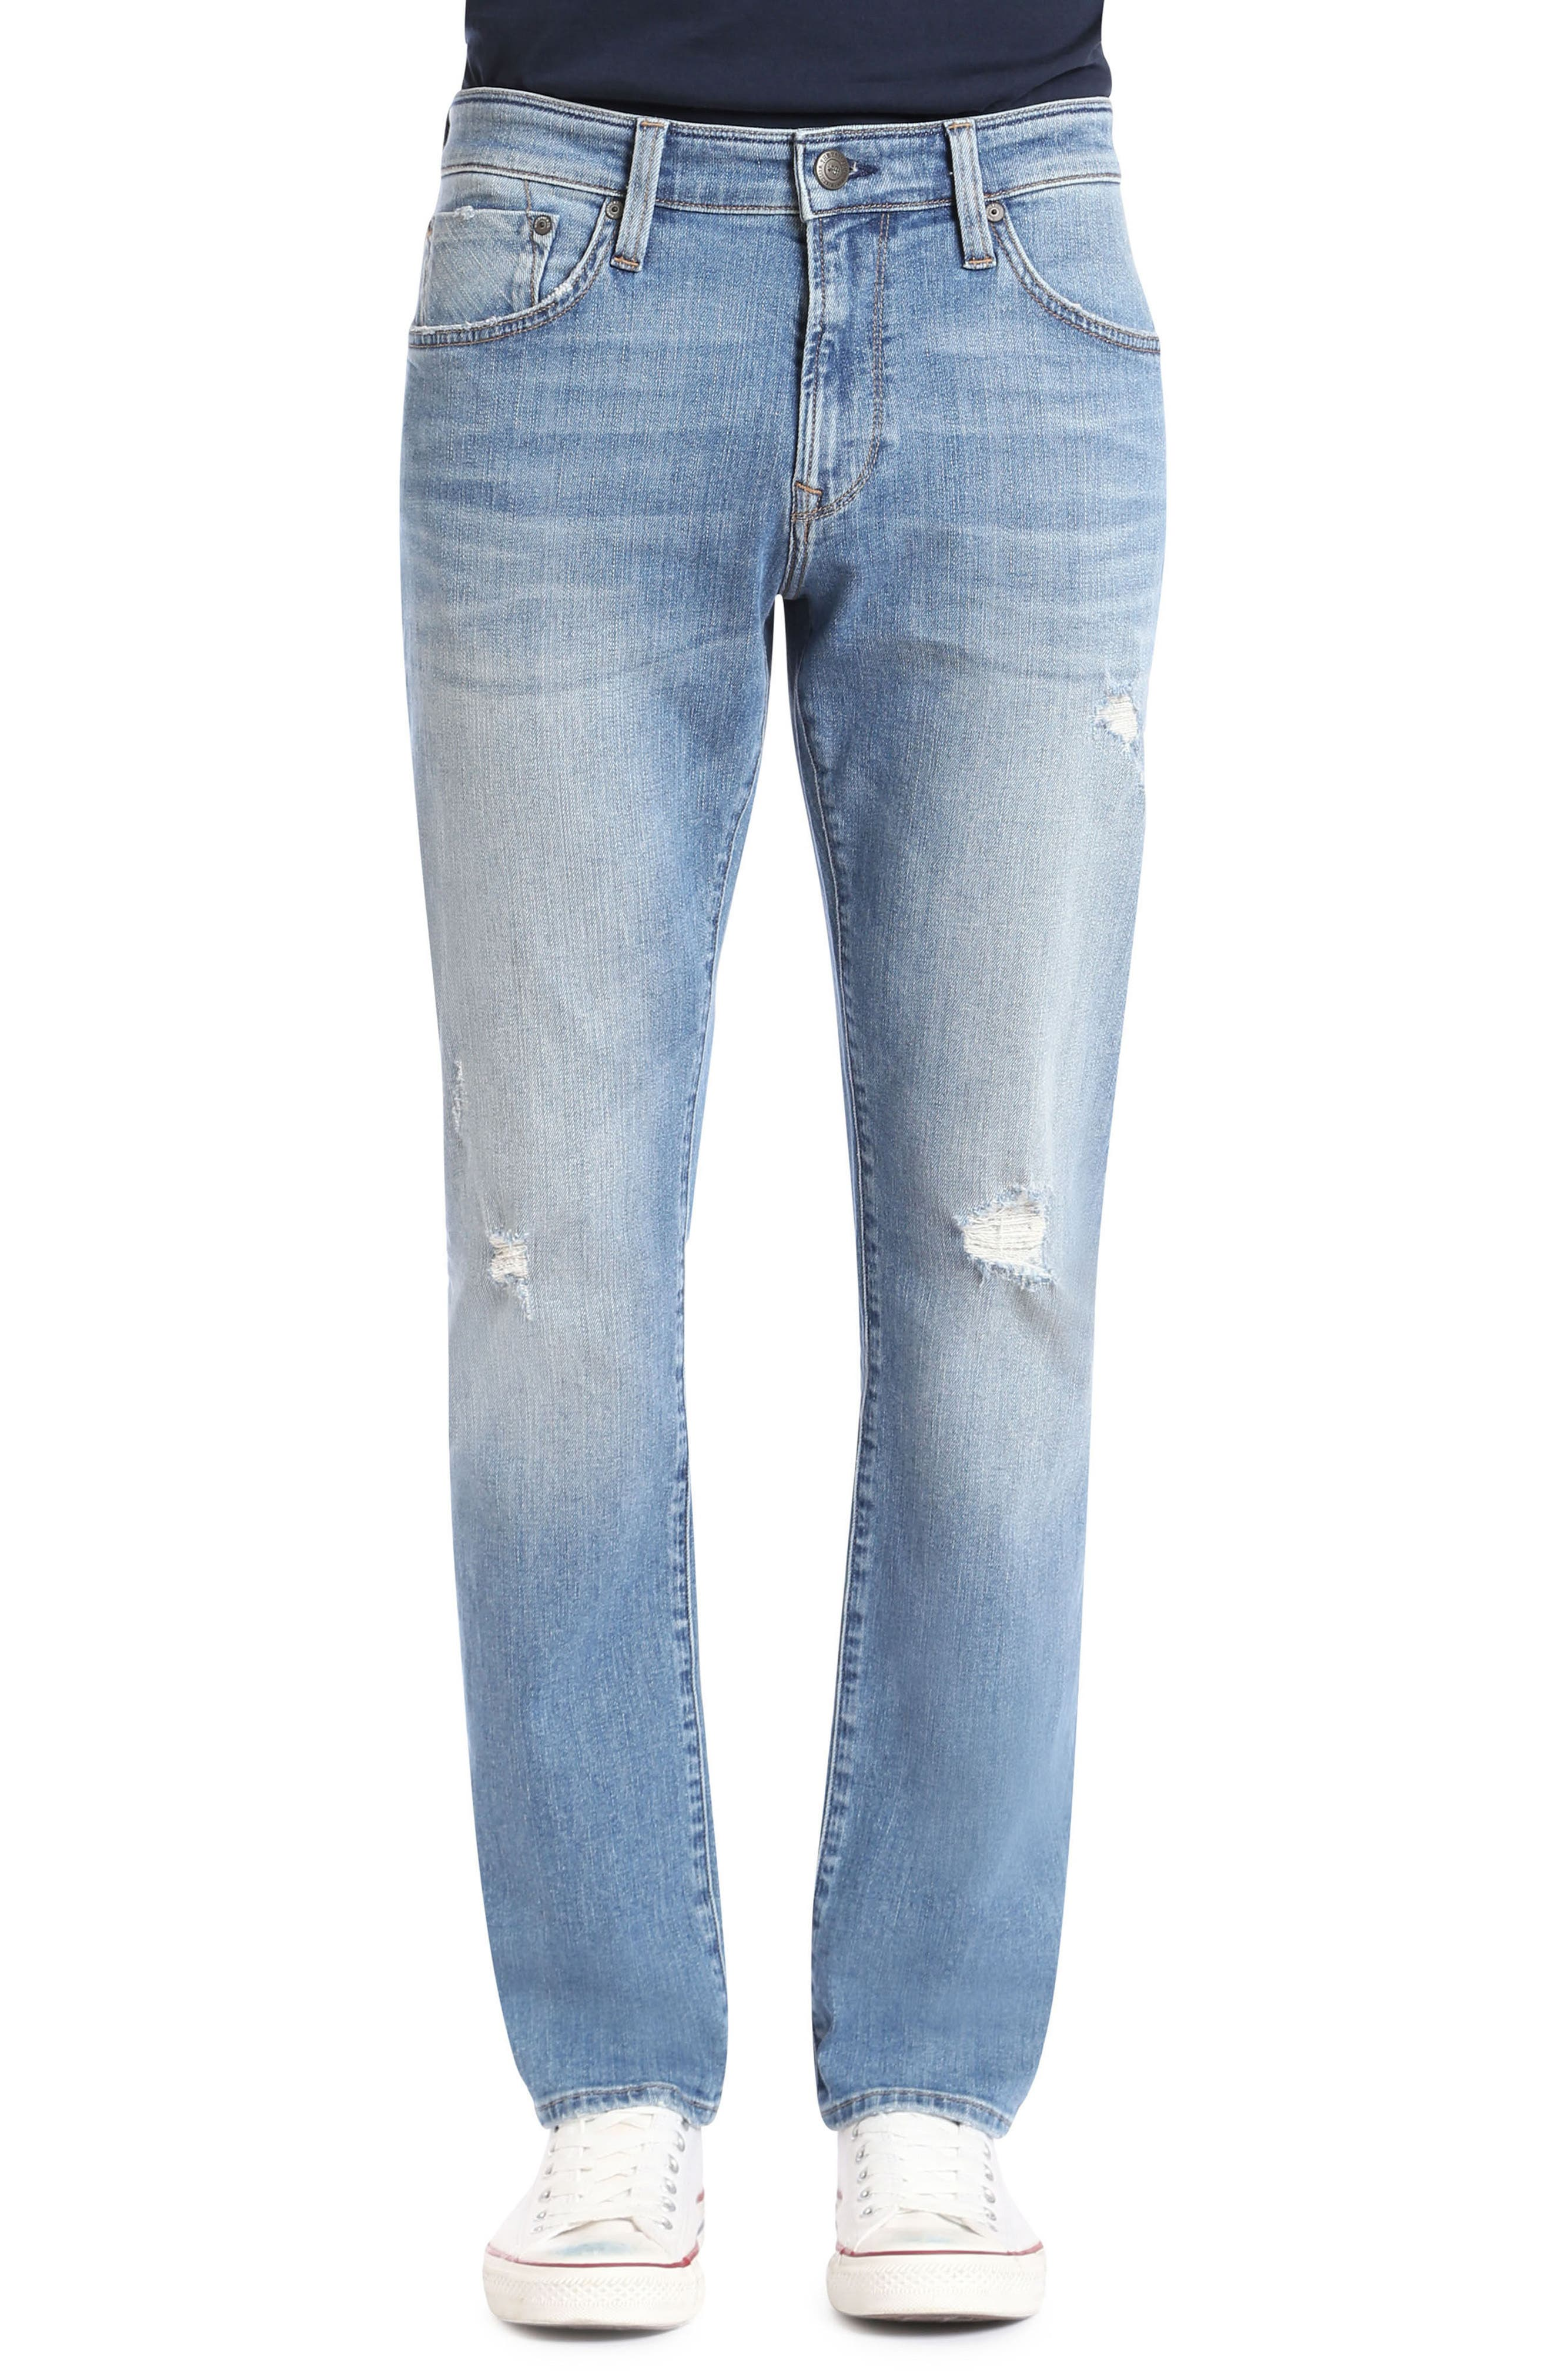 Marcus Slim Straight Leg Jeans,                             Main thumbnail 1, color,                             Light Used Authentic Vintage